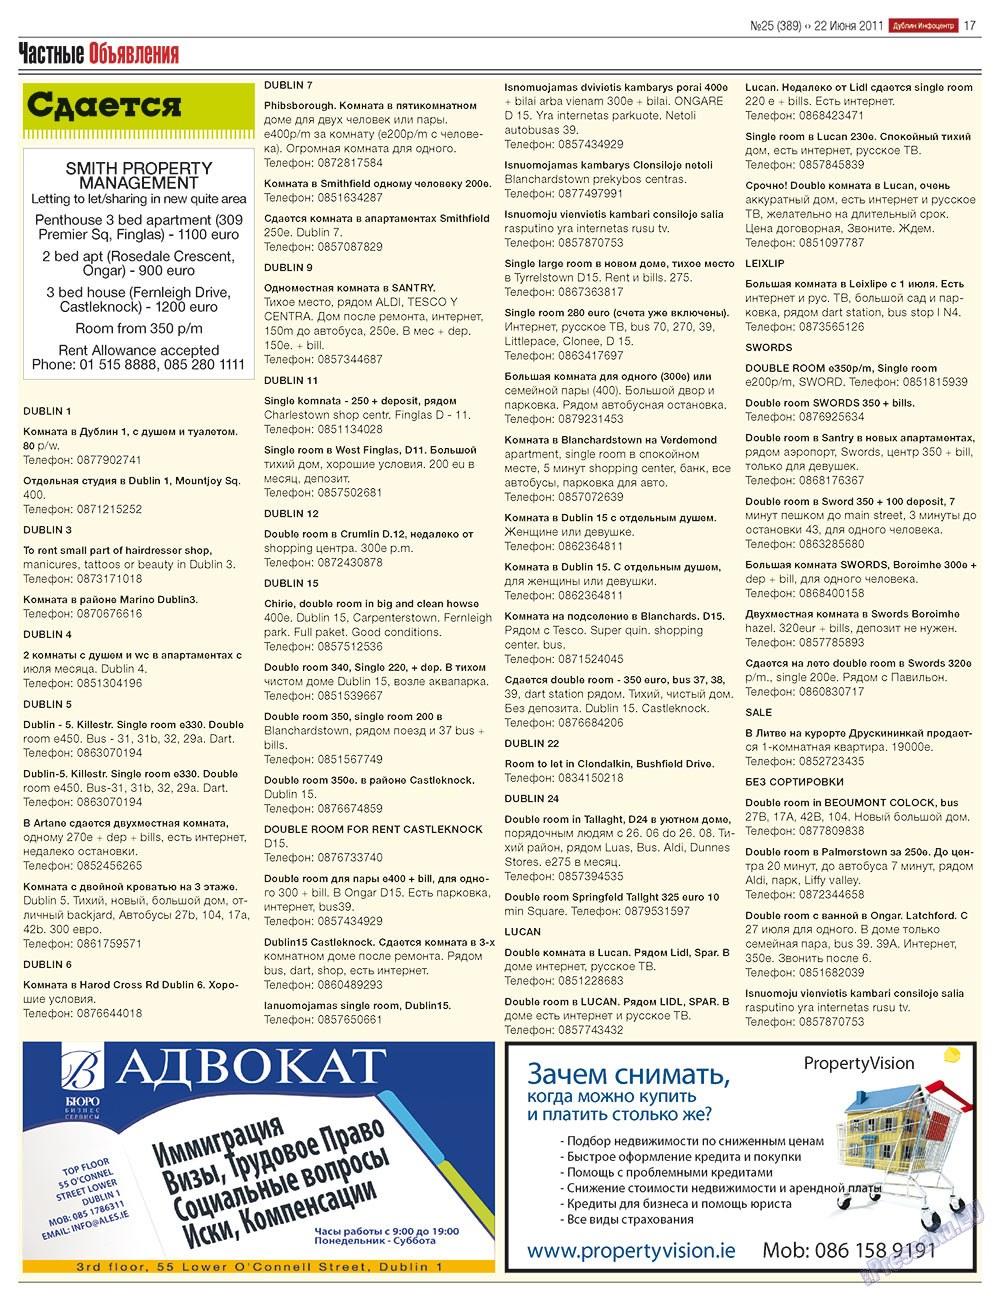 Дублин инфоцентр (газета). 2011 год, номер 25, стр. 17